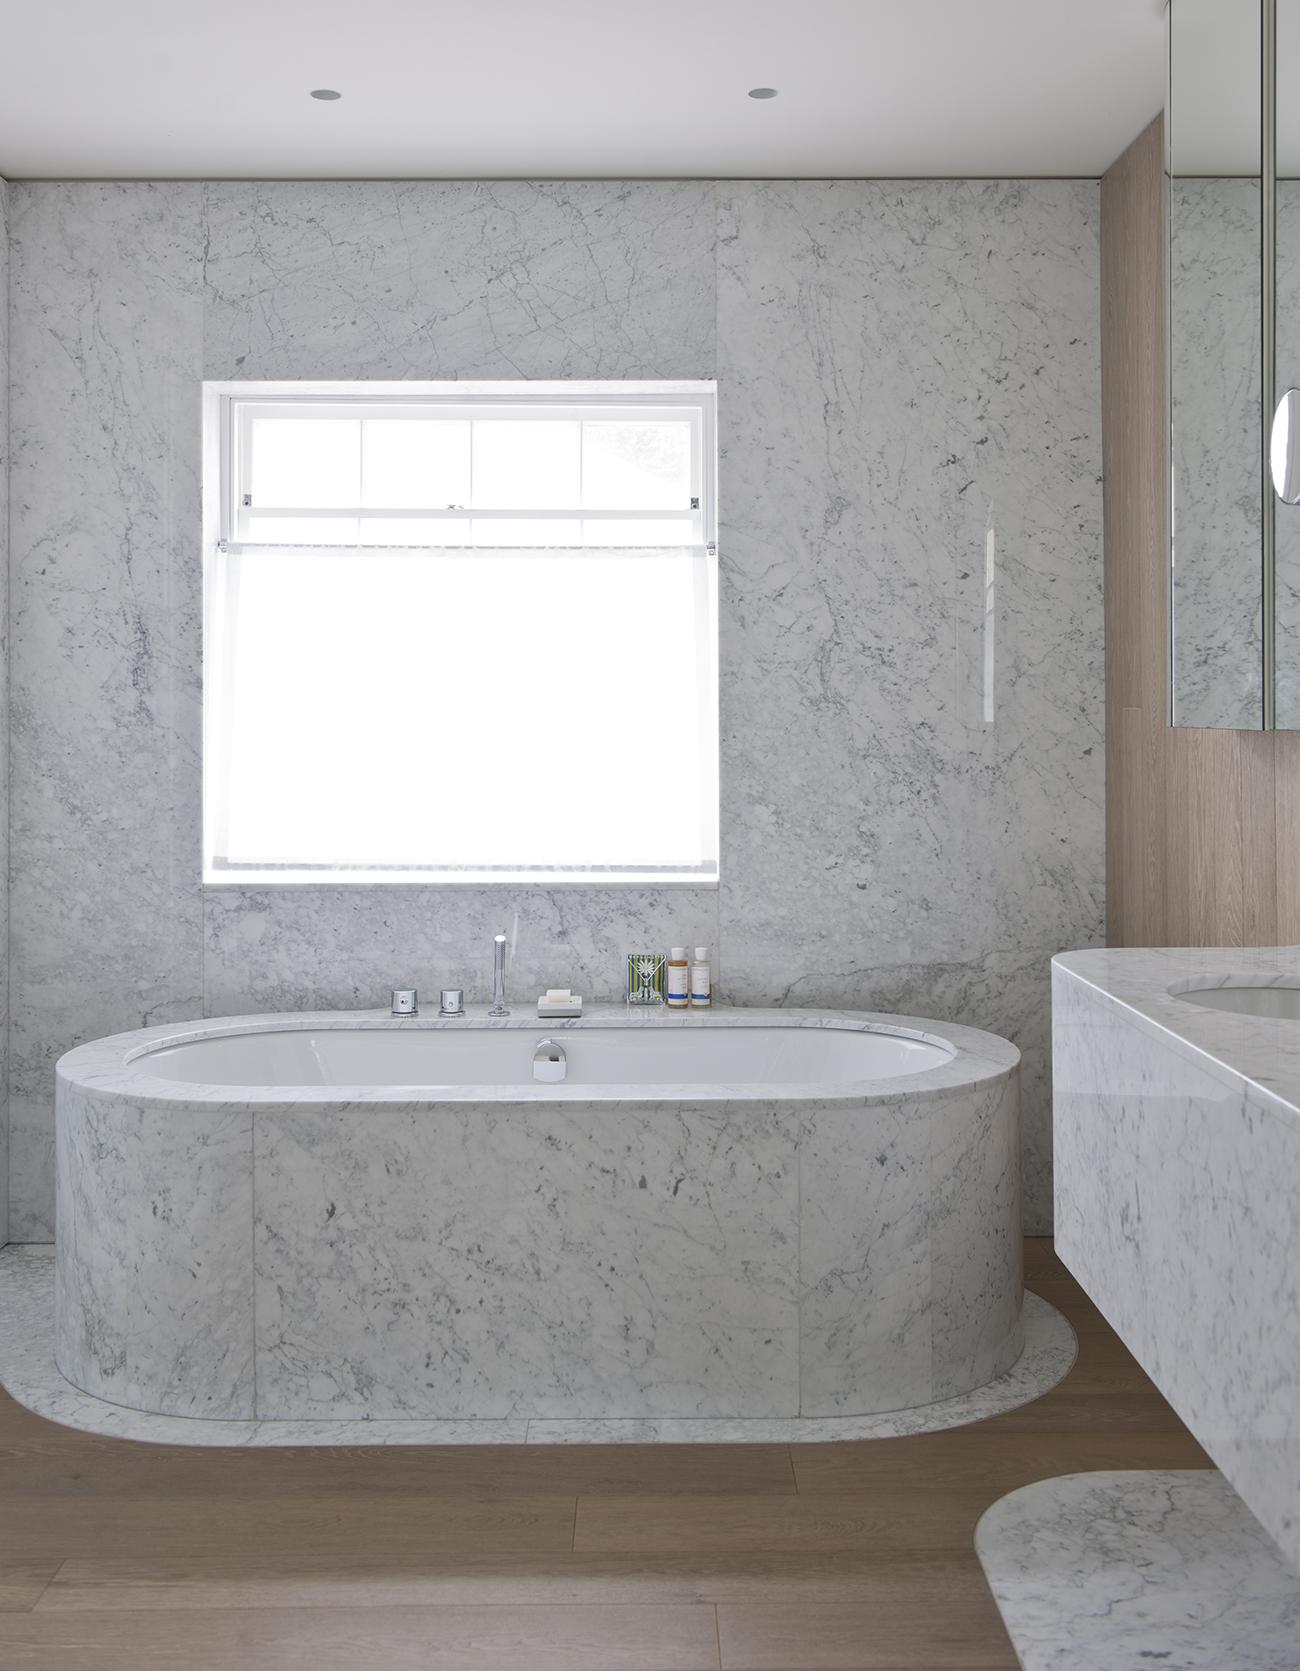 Mews-4-London-Hyde-Park-Andy-Martin-Architects-LG6.jpg